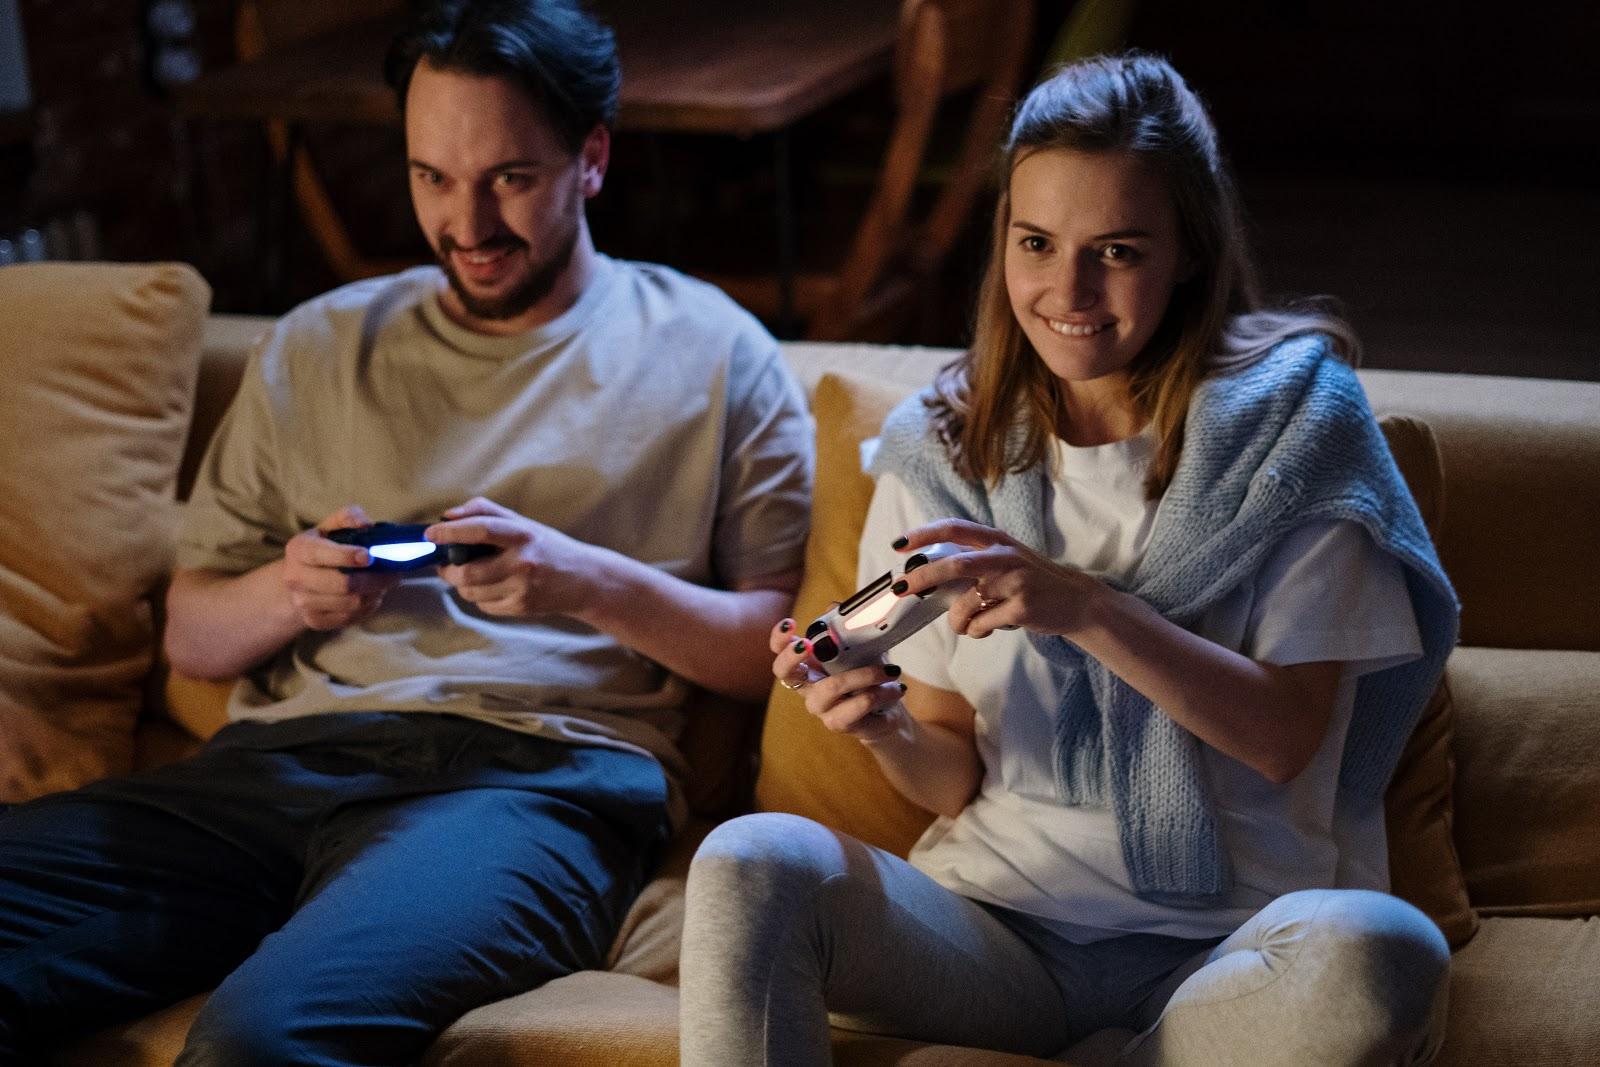 Online Entertainment Ideas to Beat Lockdown Boredom